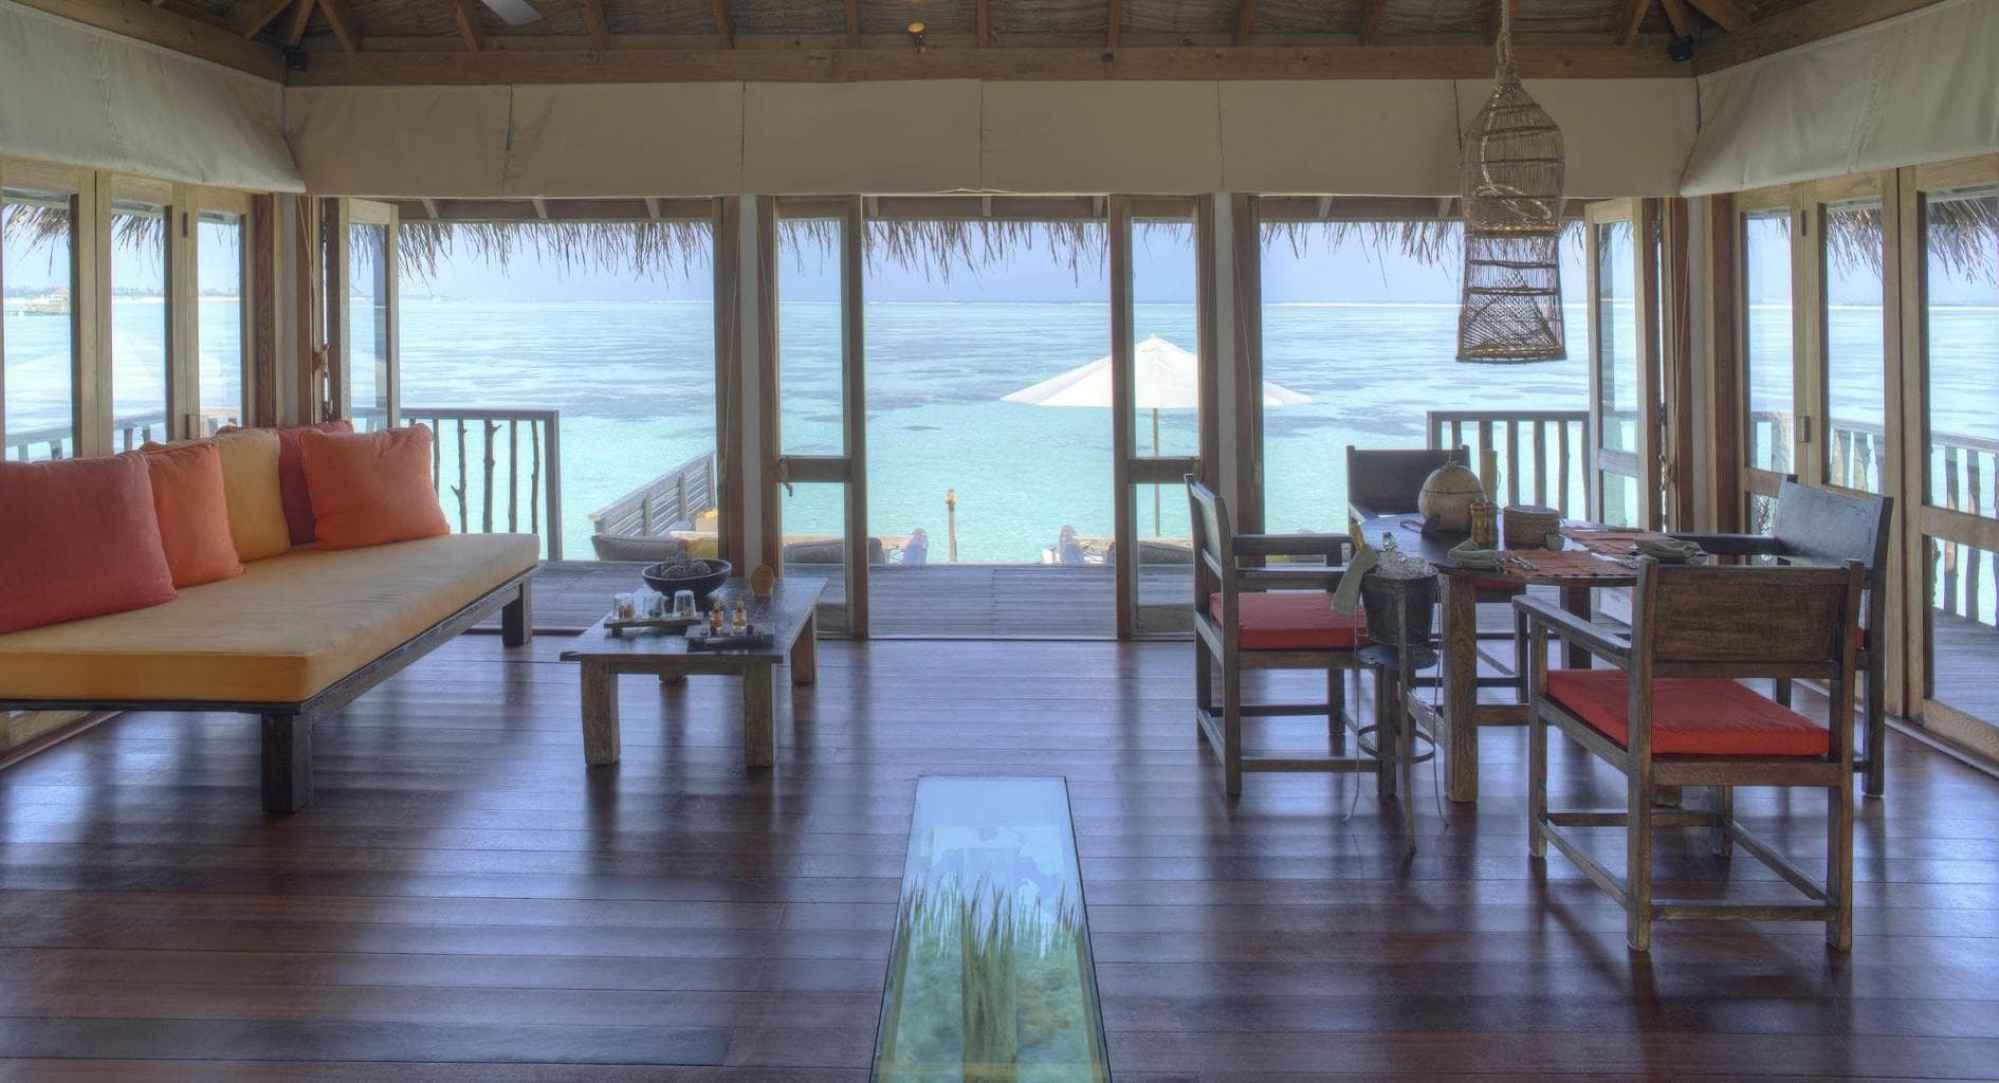 Living room of the Residence Villas - Courtesy of Gili Lankanfushi